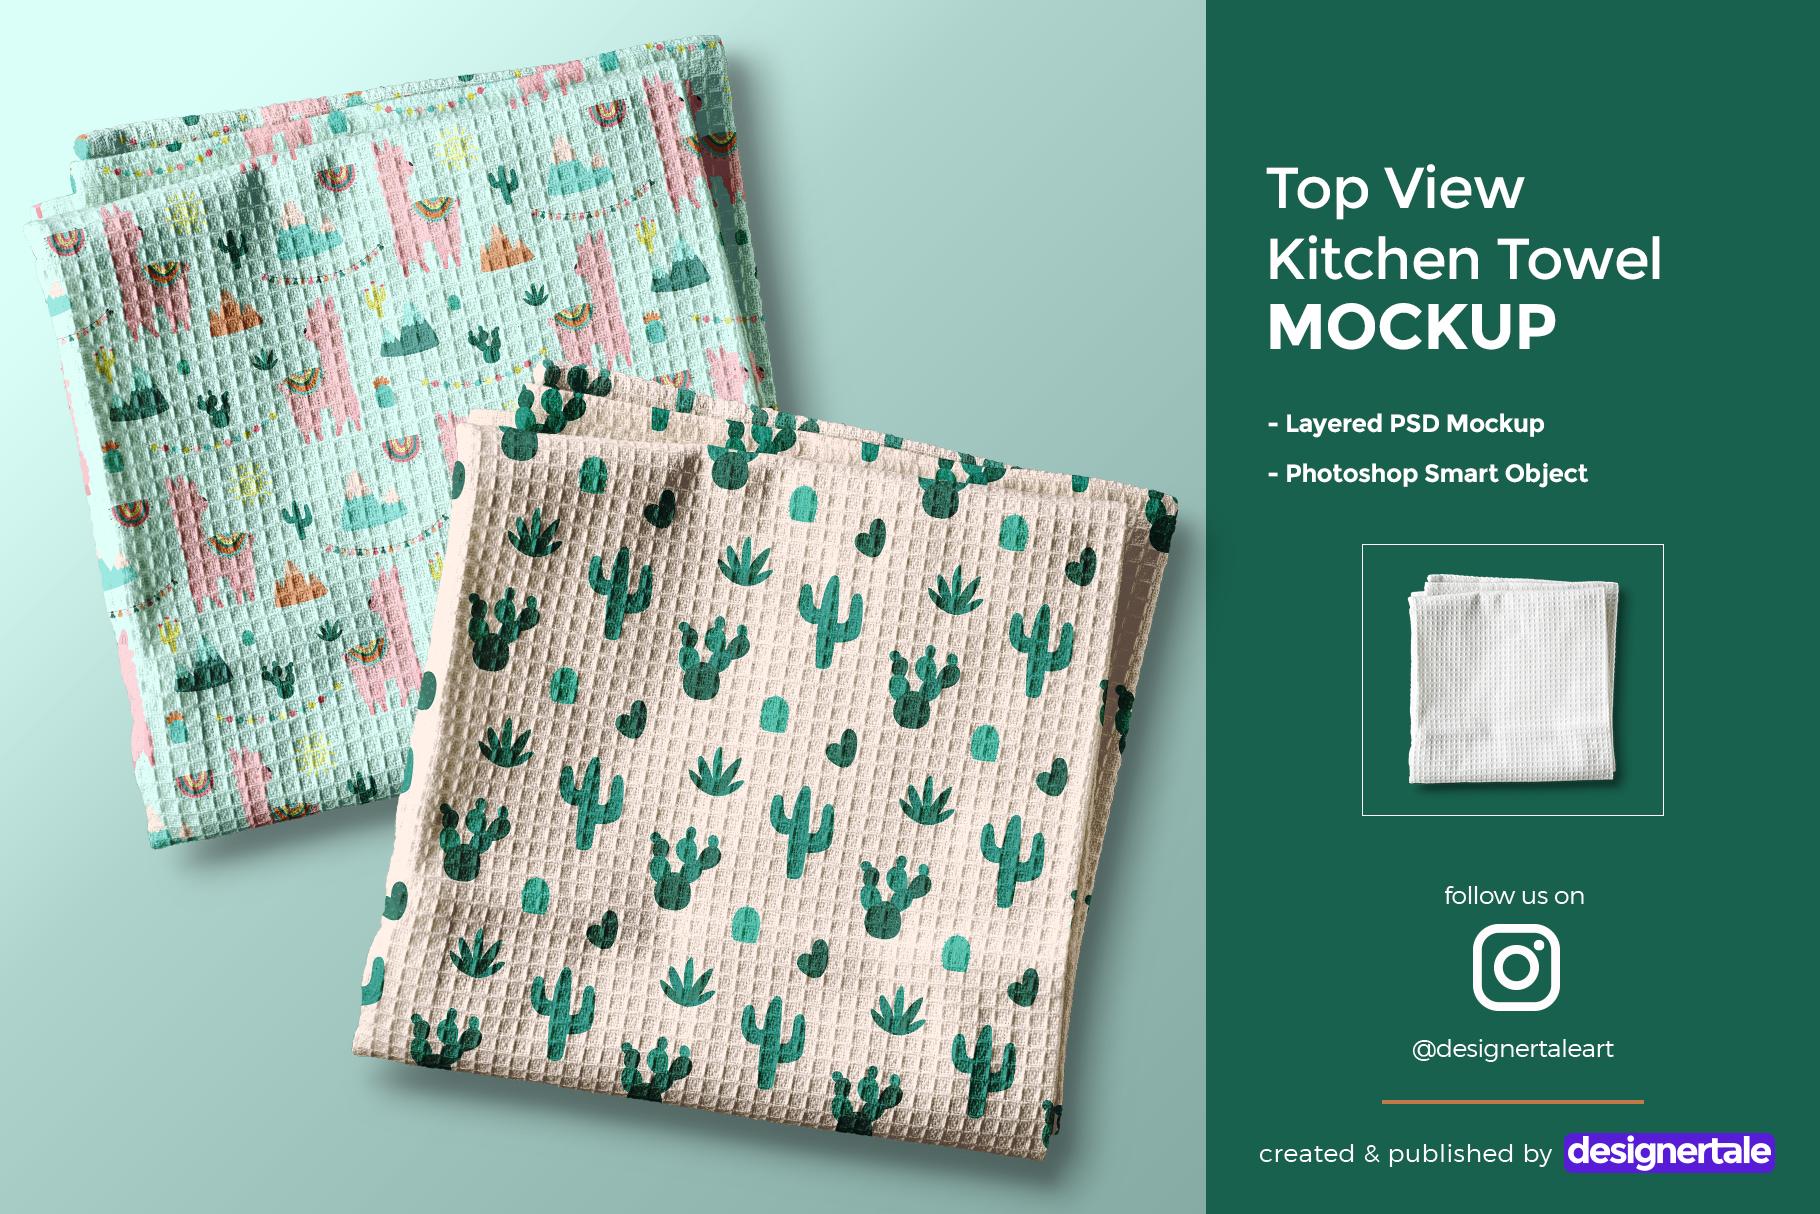 top view kitchen towel mockup